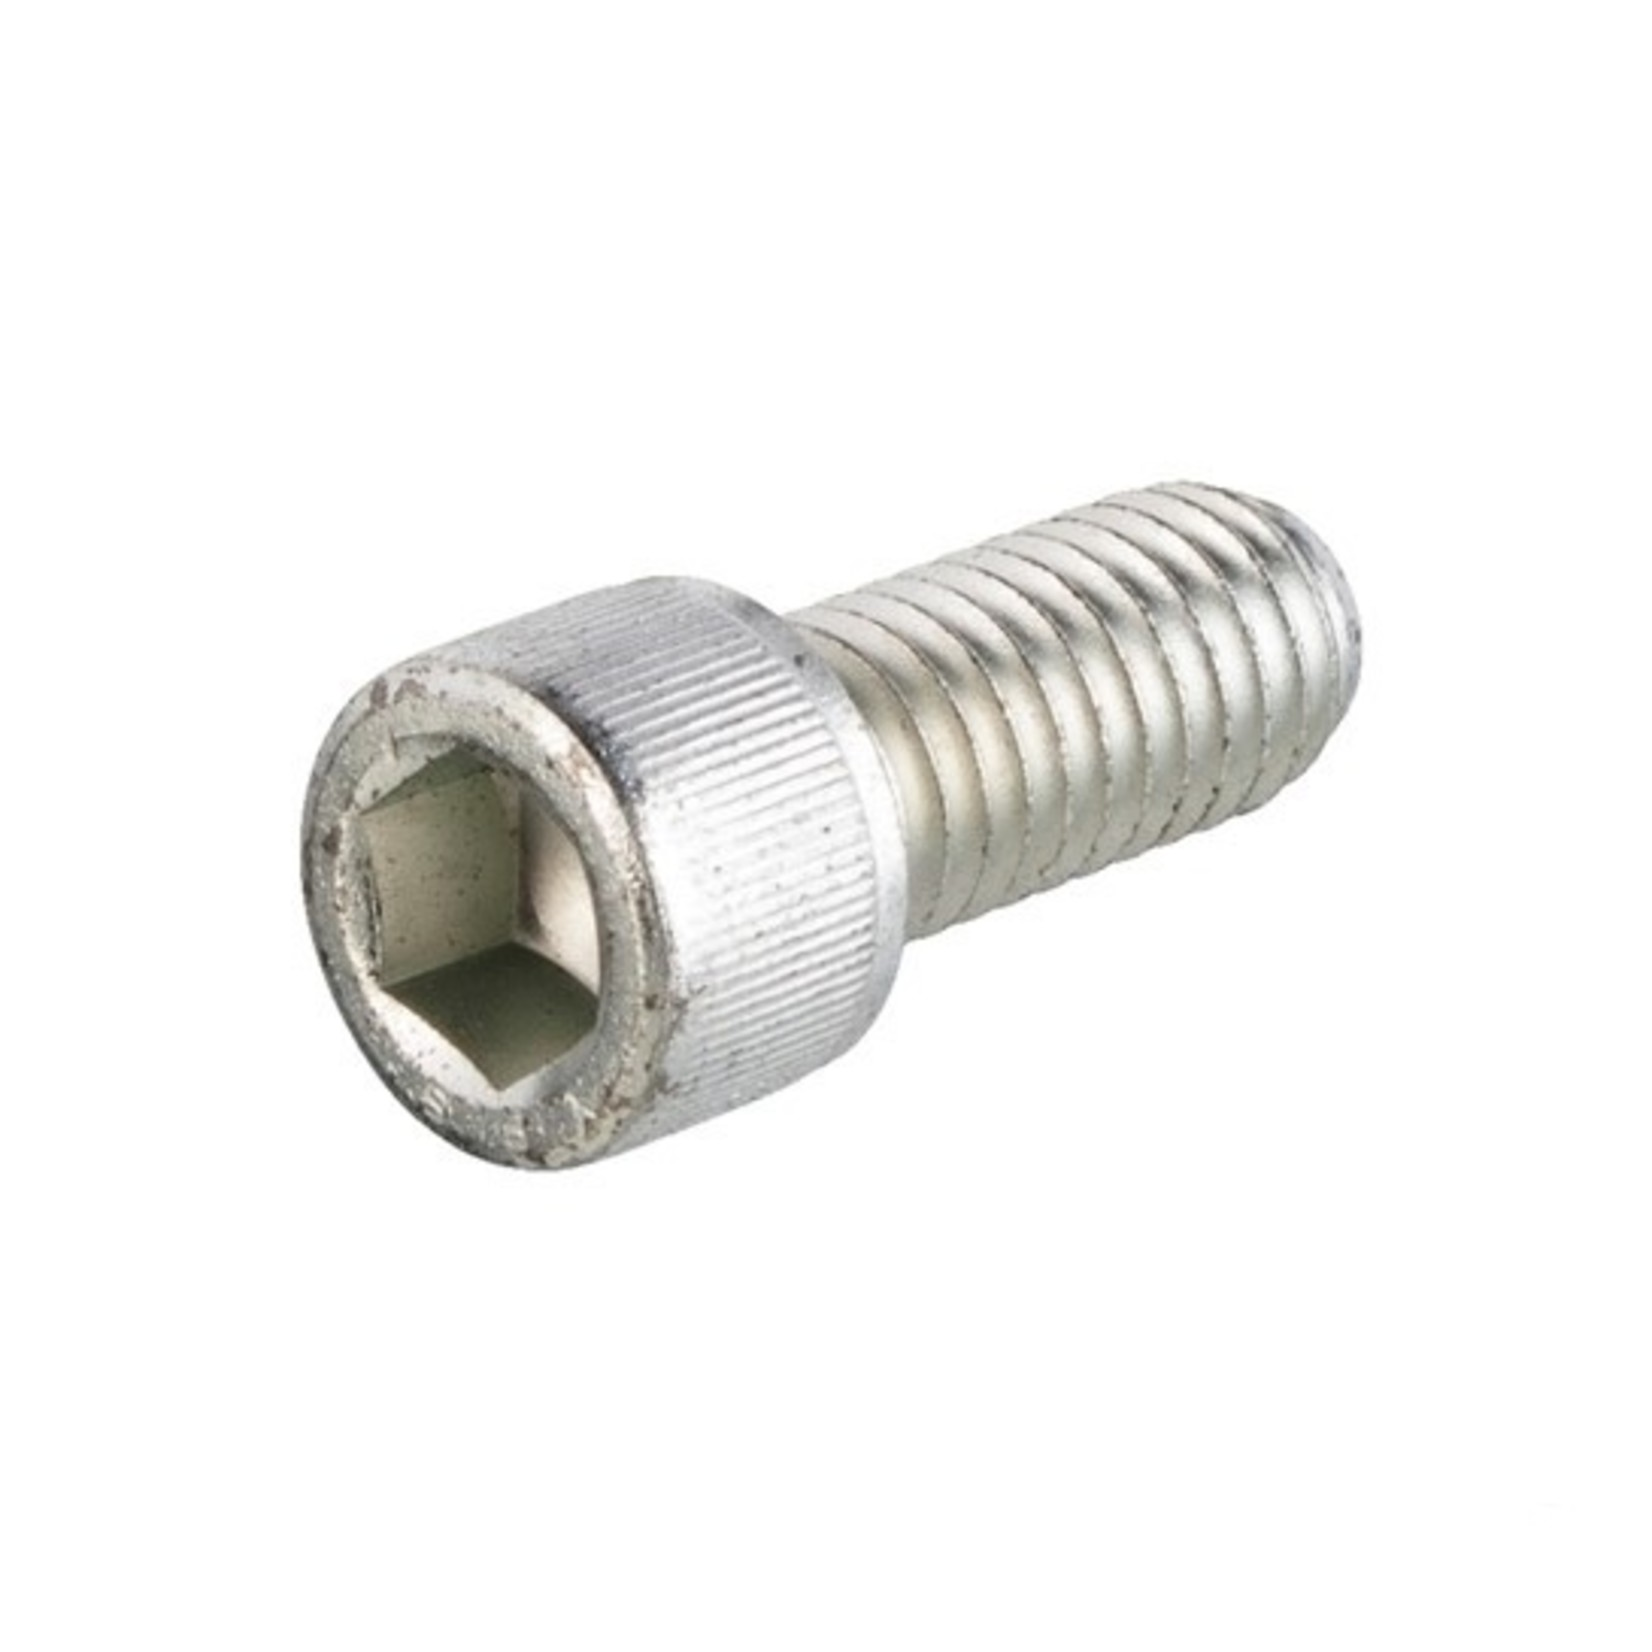 Inbusbout 7/16 - 14 UNC Staal verzinkt x 1 inch (25mm)